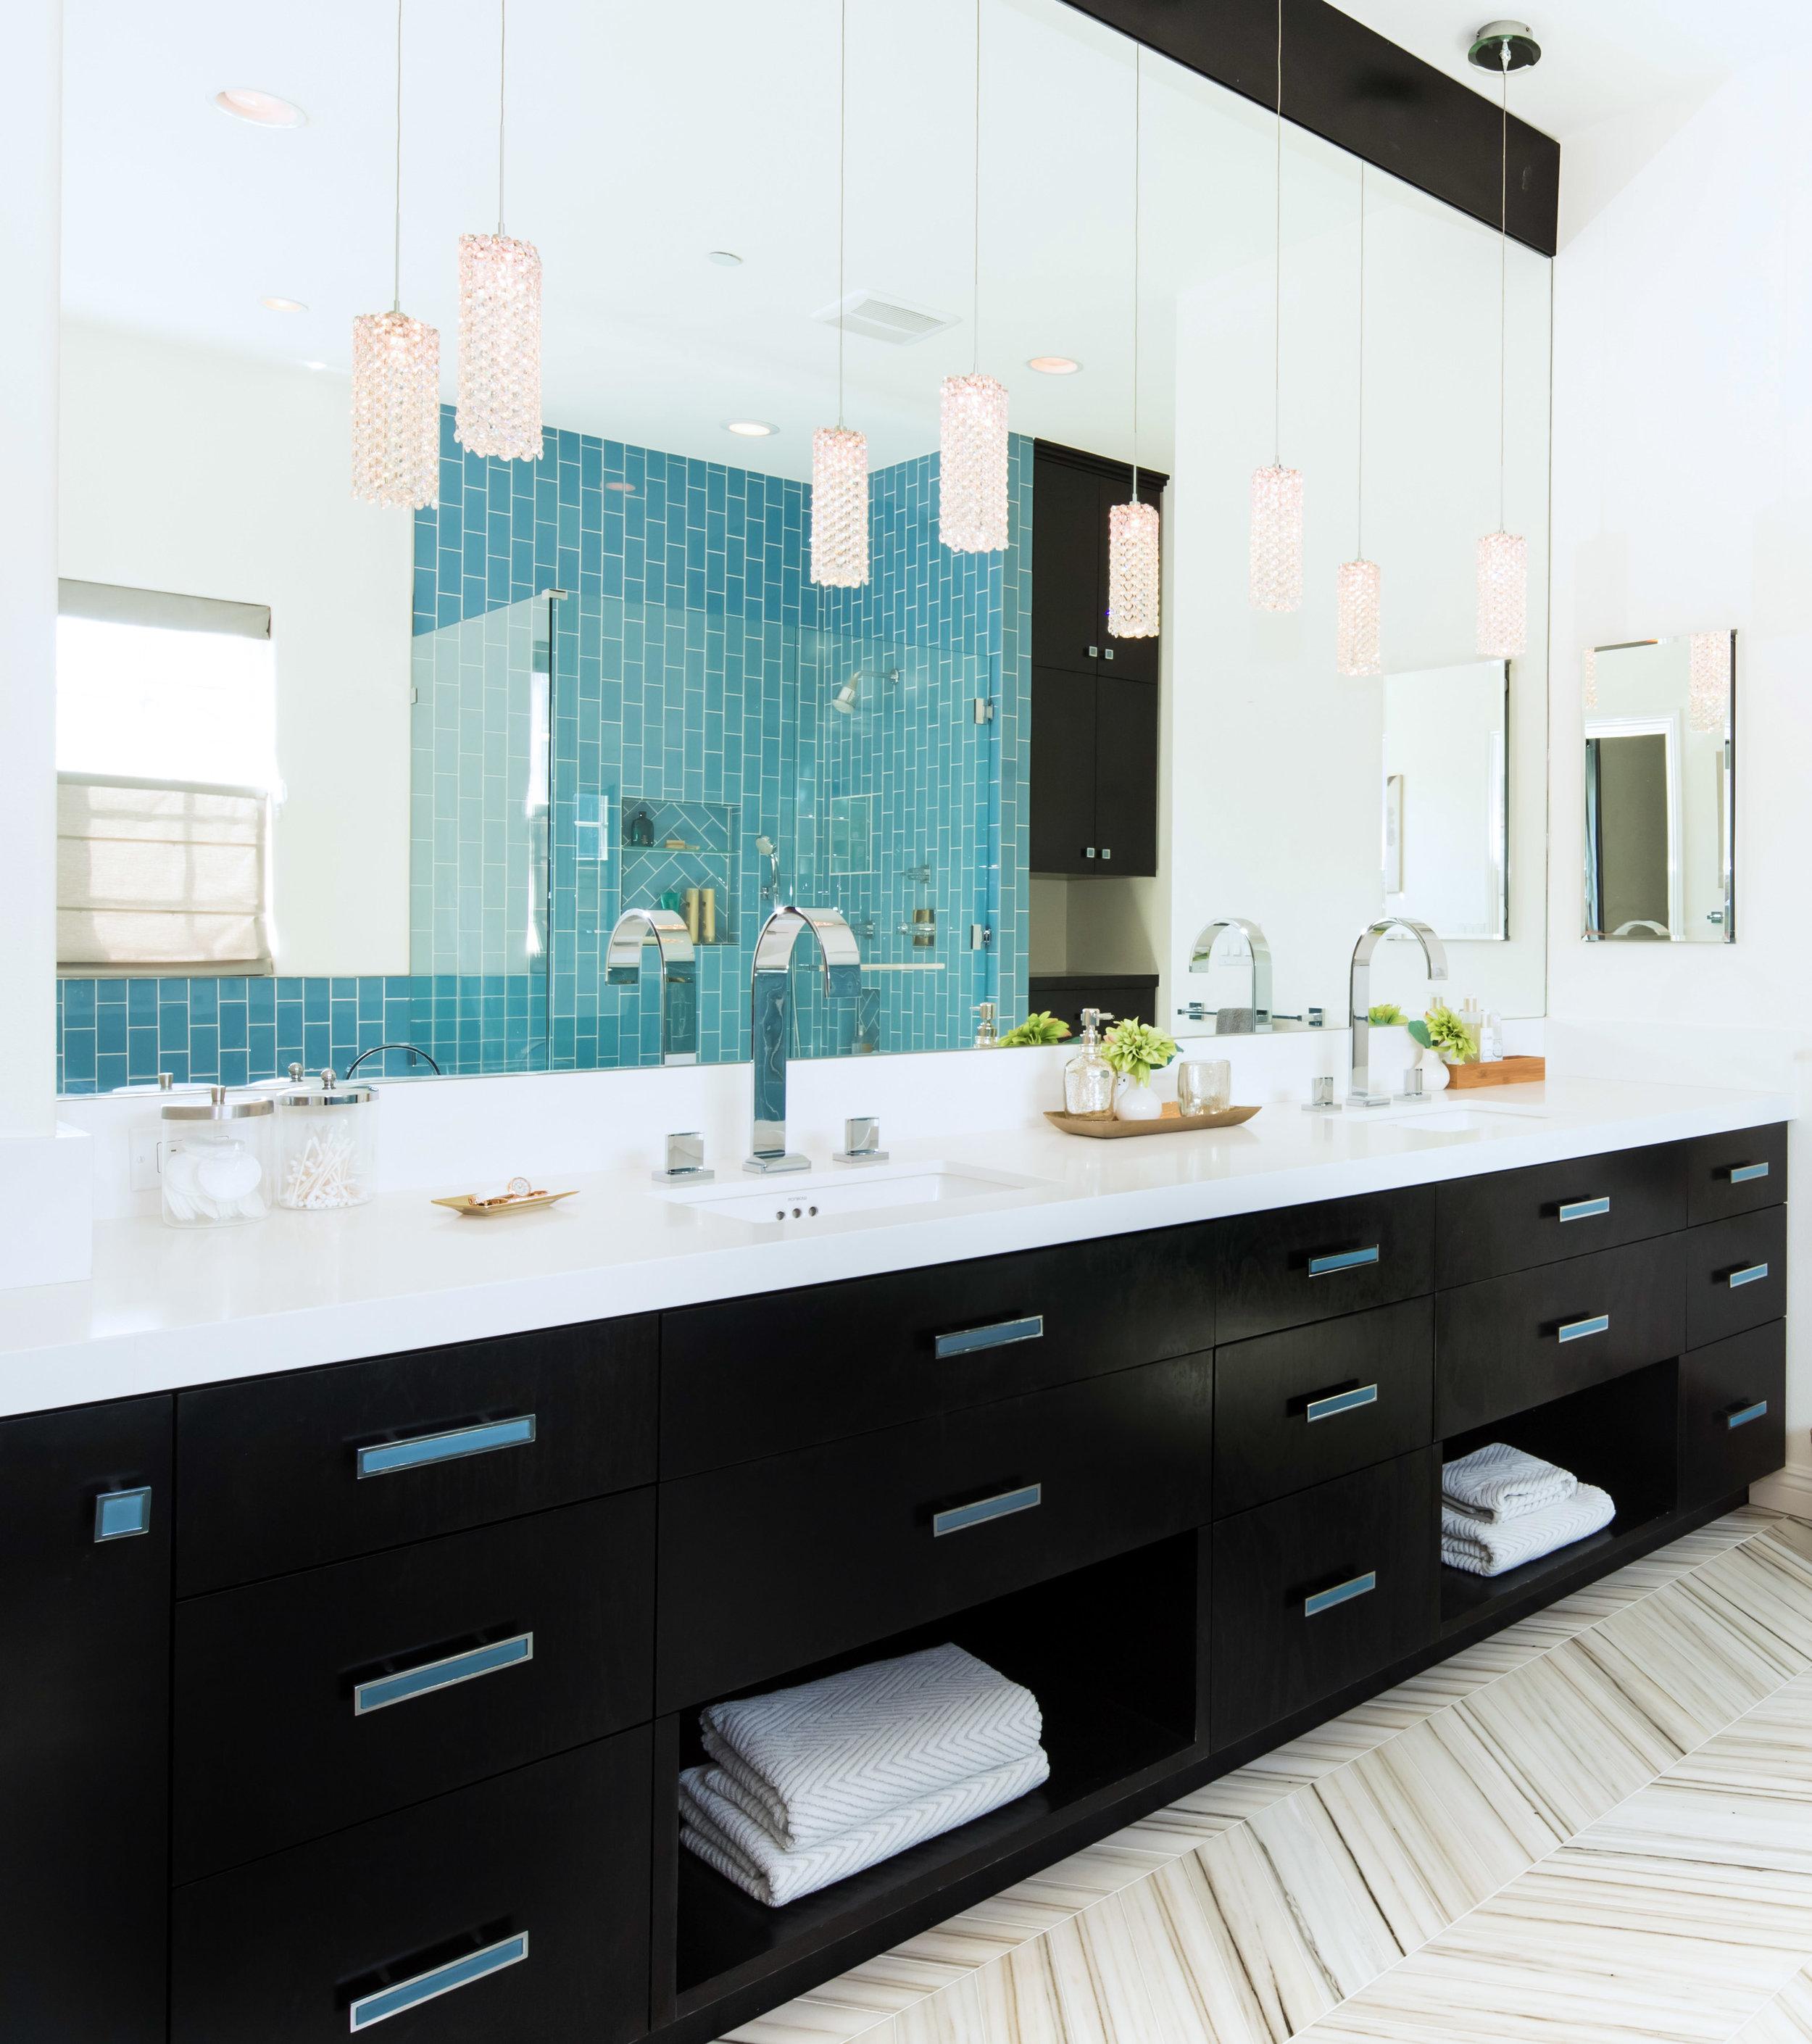 EMI Culver City Bathroom-31.JPG